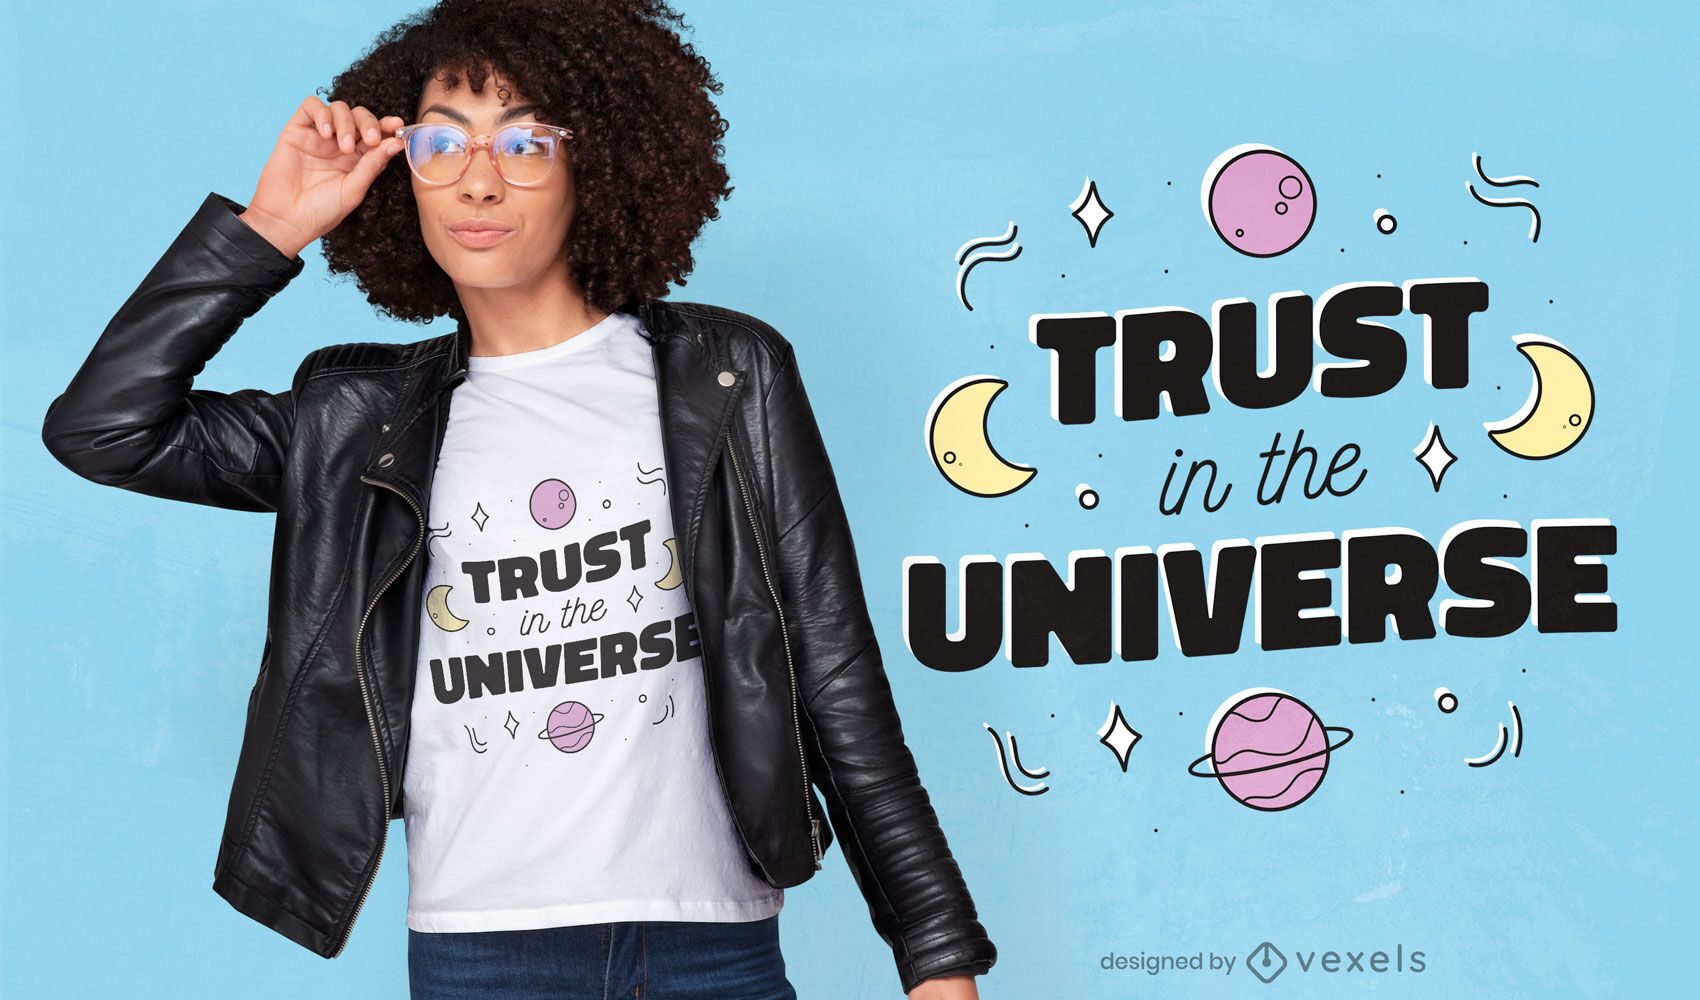 Trust in the universe t-shirt design